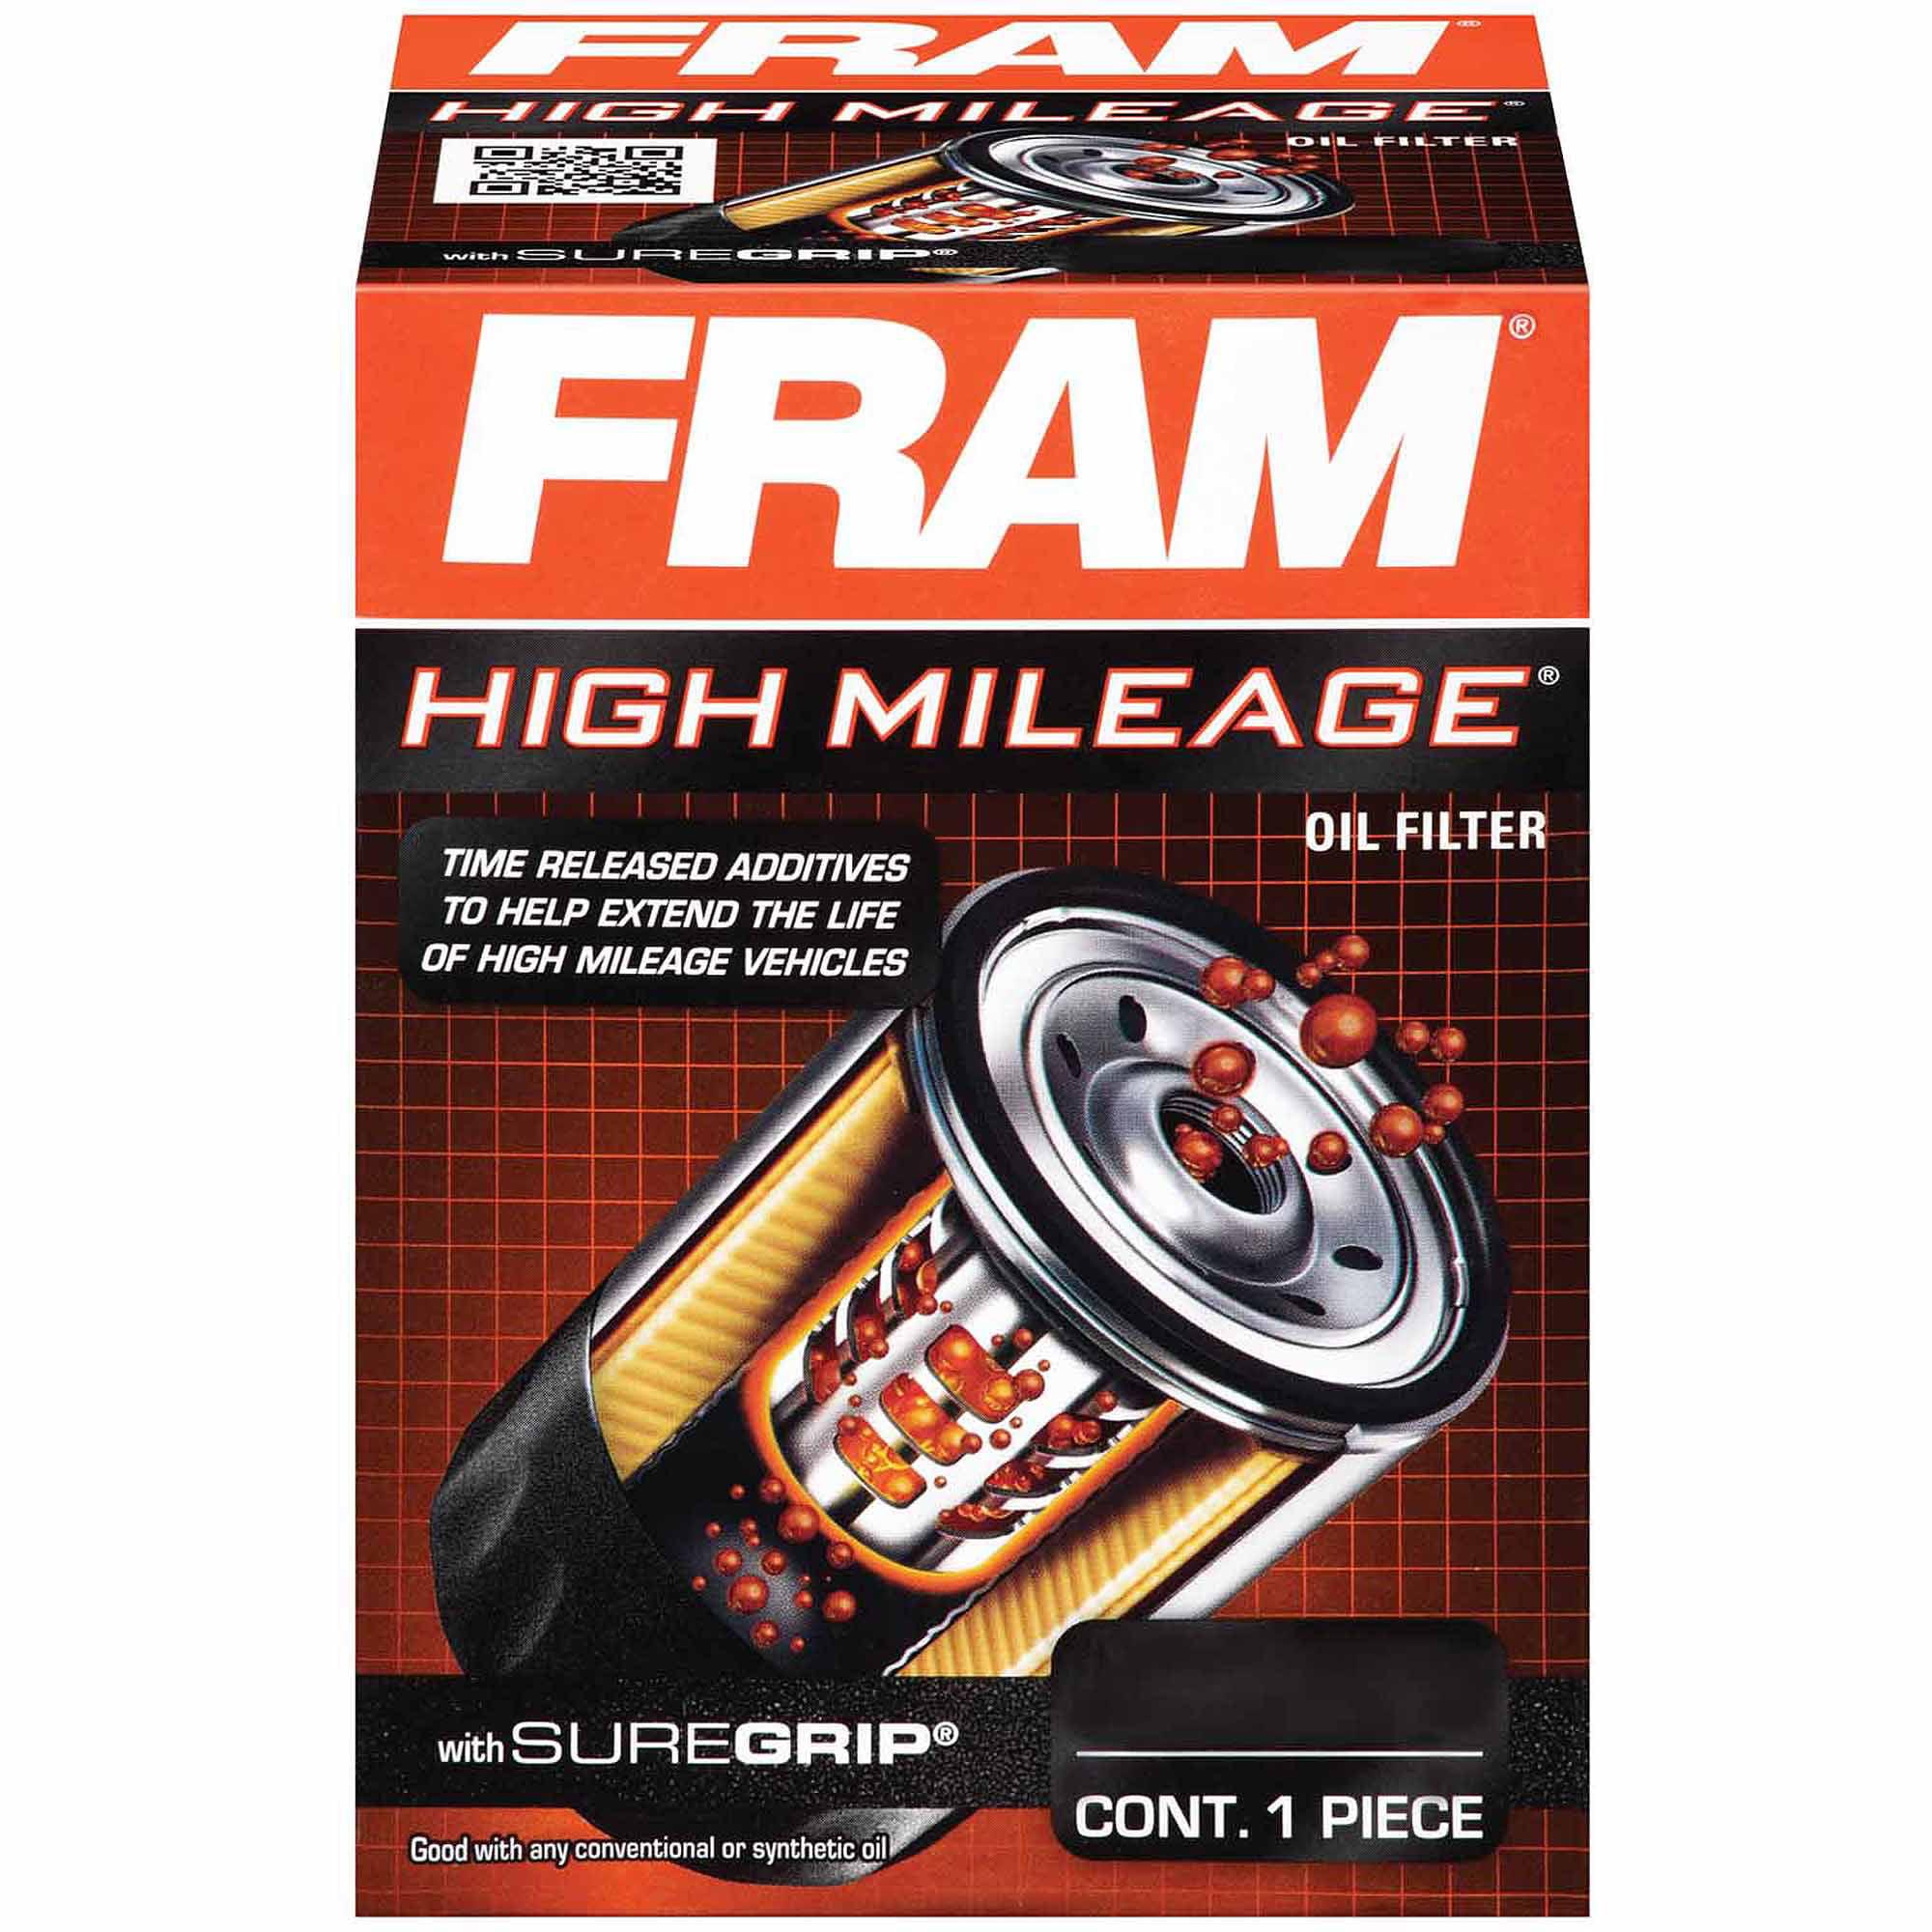 FRAM High Mileage Oil Filter, HM3593A